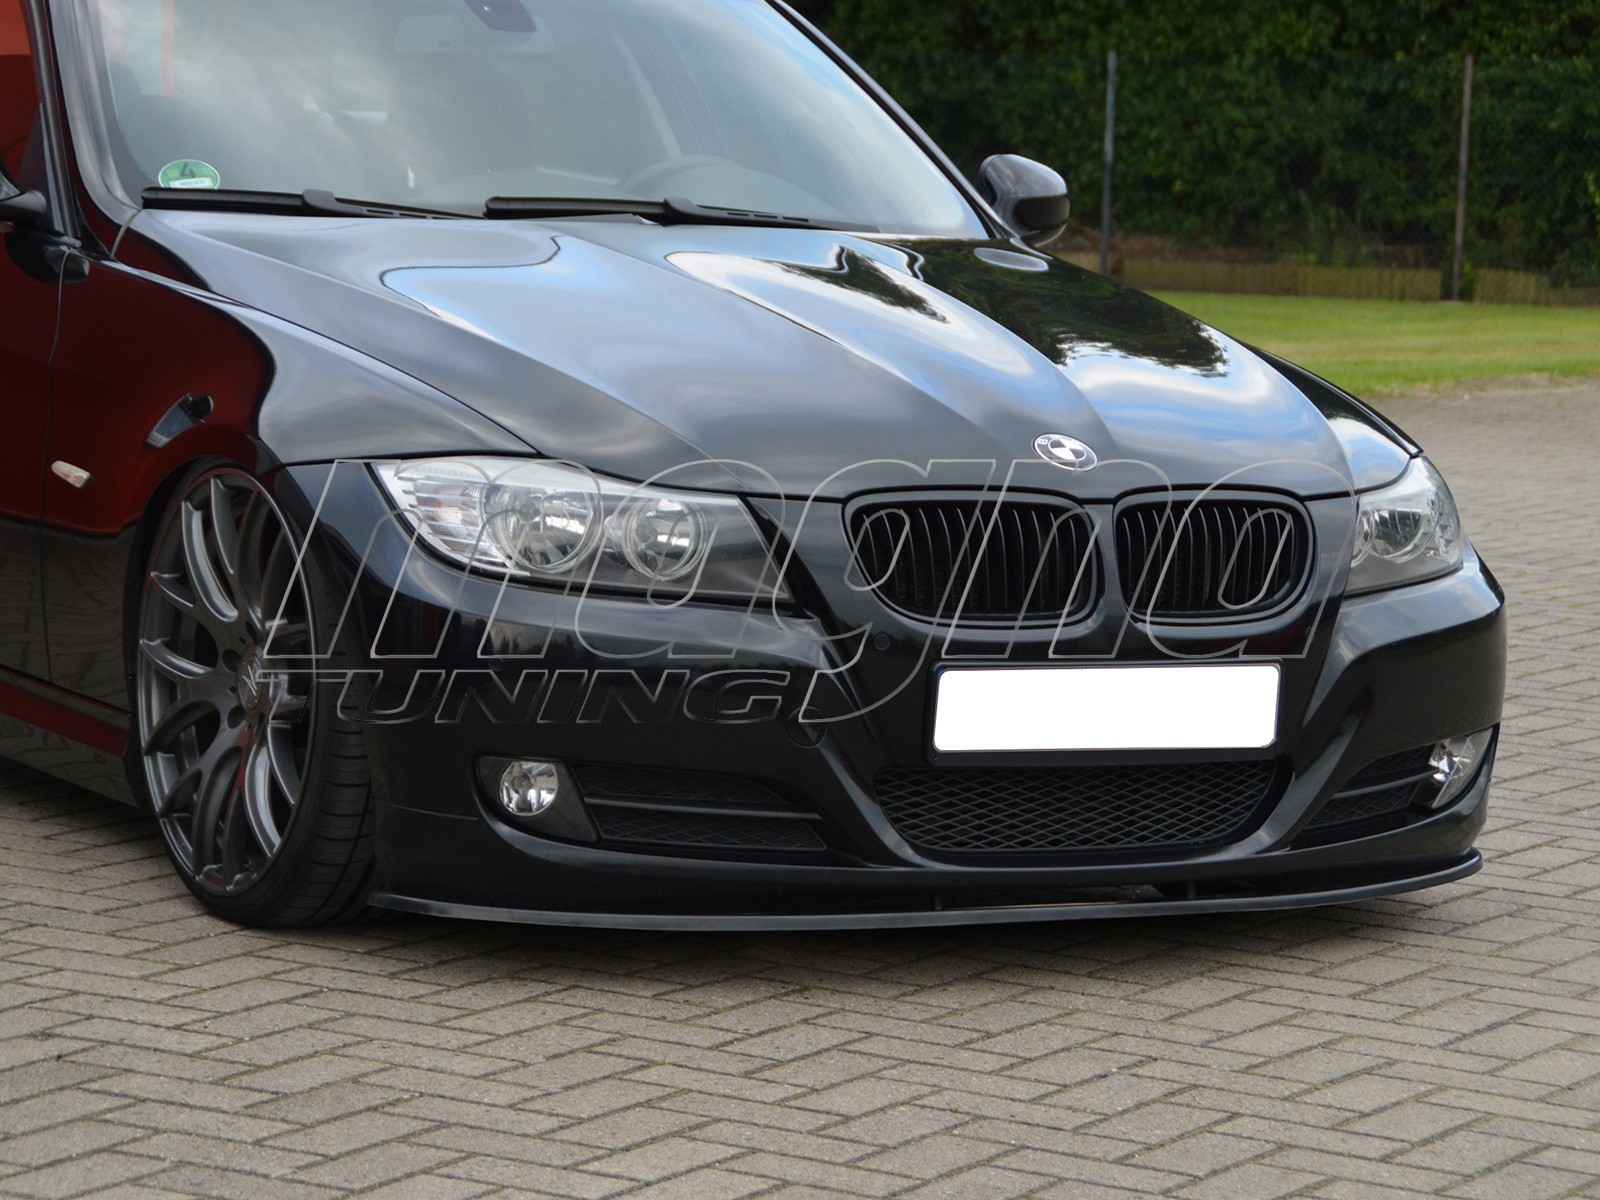 bmw e90 e91 facelift iris front bumper extension. Black Bedroom Furniture Sets. Home Design Ideas